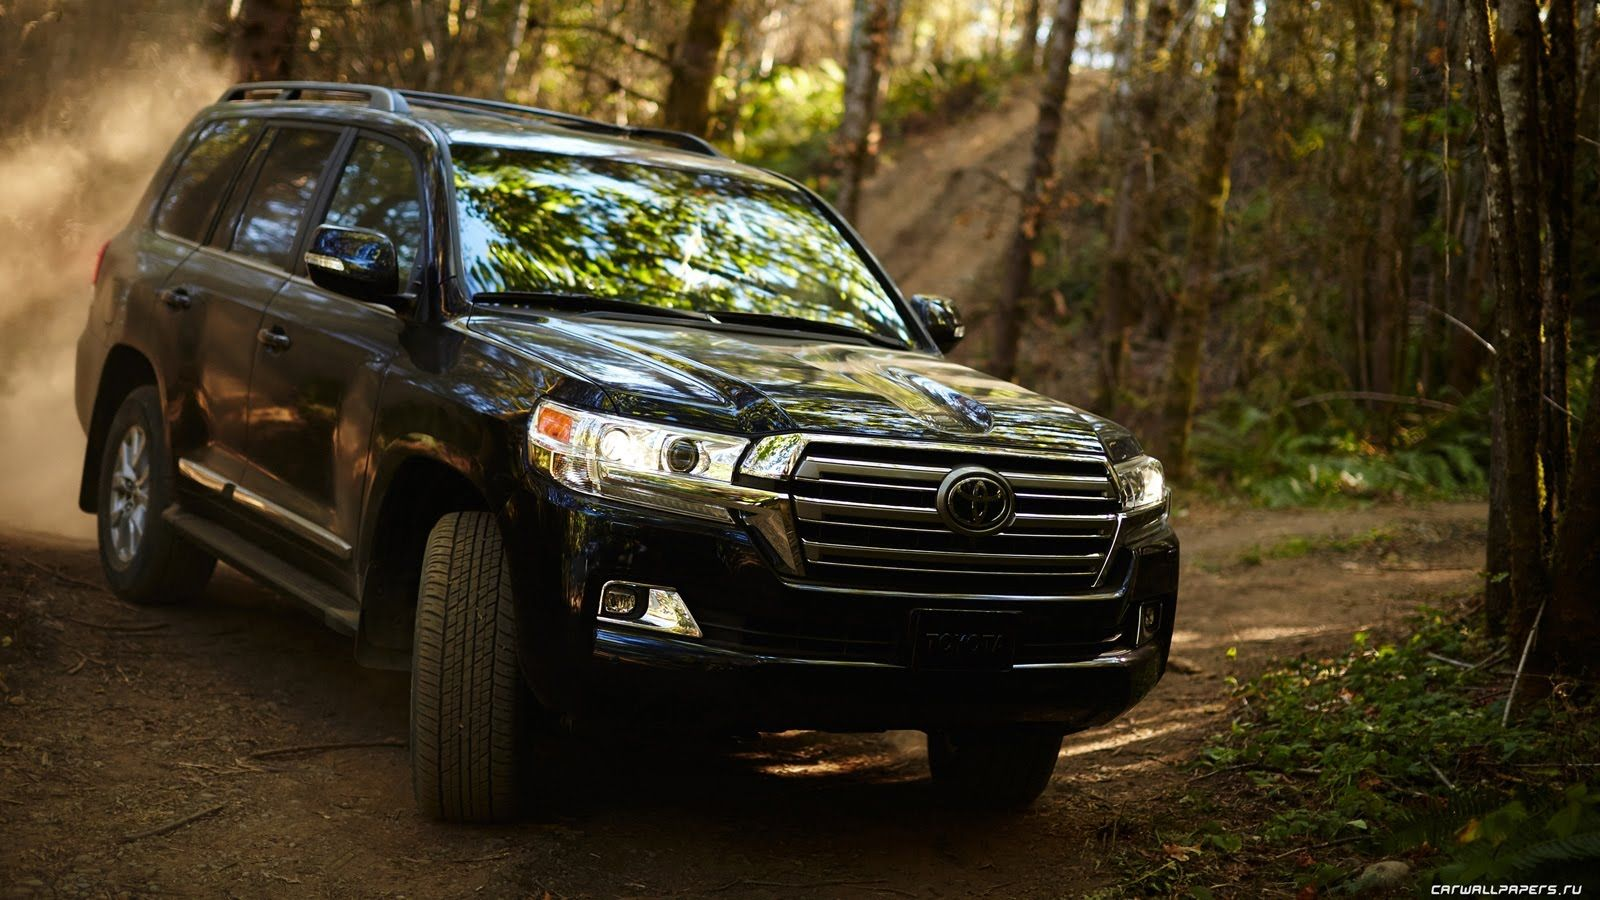 2018 Toyota Land Cruiser Diesel Engine Future Cars Pictures Prado